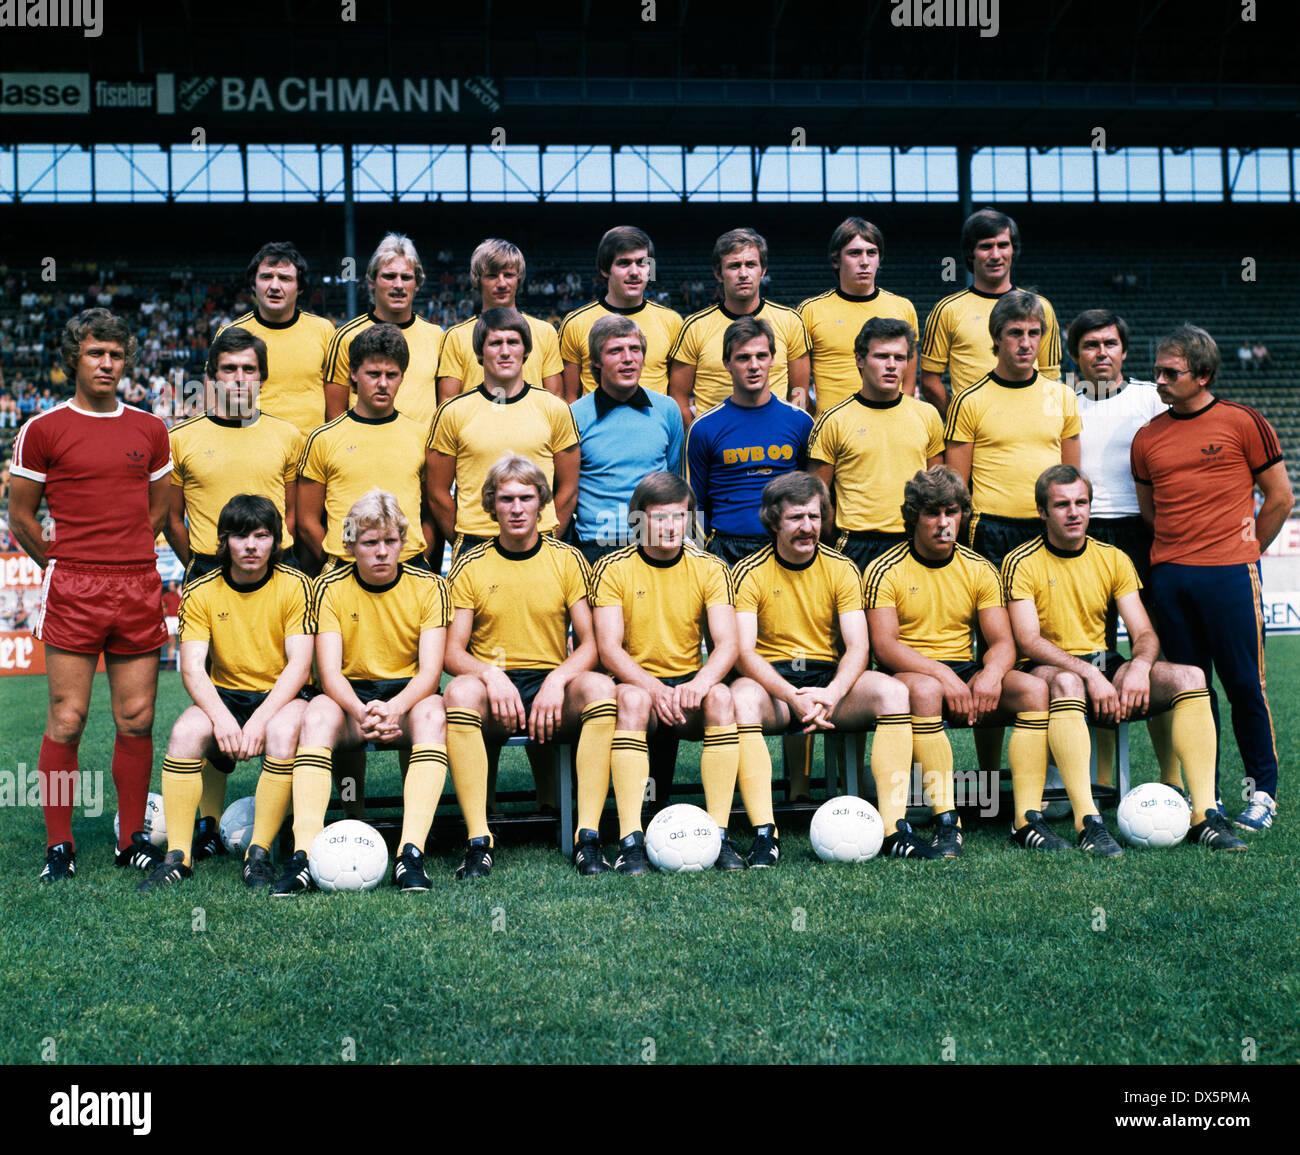 football, Bundesliga, 1976/1977, Borussia Dortmund, team presentation, team shot, behind f.l.t.r. Willi Lippens, Hans-Gerd Schildt, Zoltan Varga, Mirko Votava, Helmut Nerlinger, Bernd Krauss, Herbert Meyer, middle f.l.t.r. coach Otto Rehhagel, Peter Geyer - Stock Image